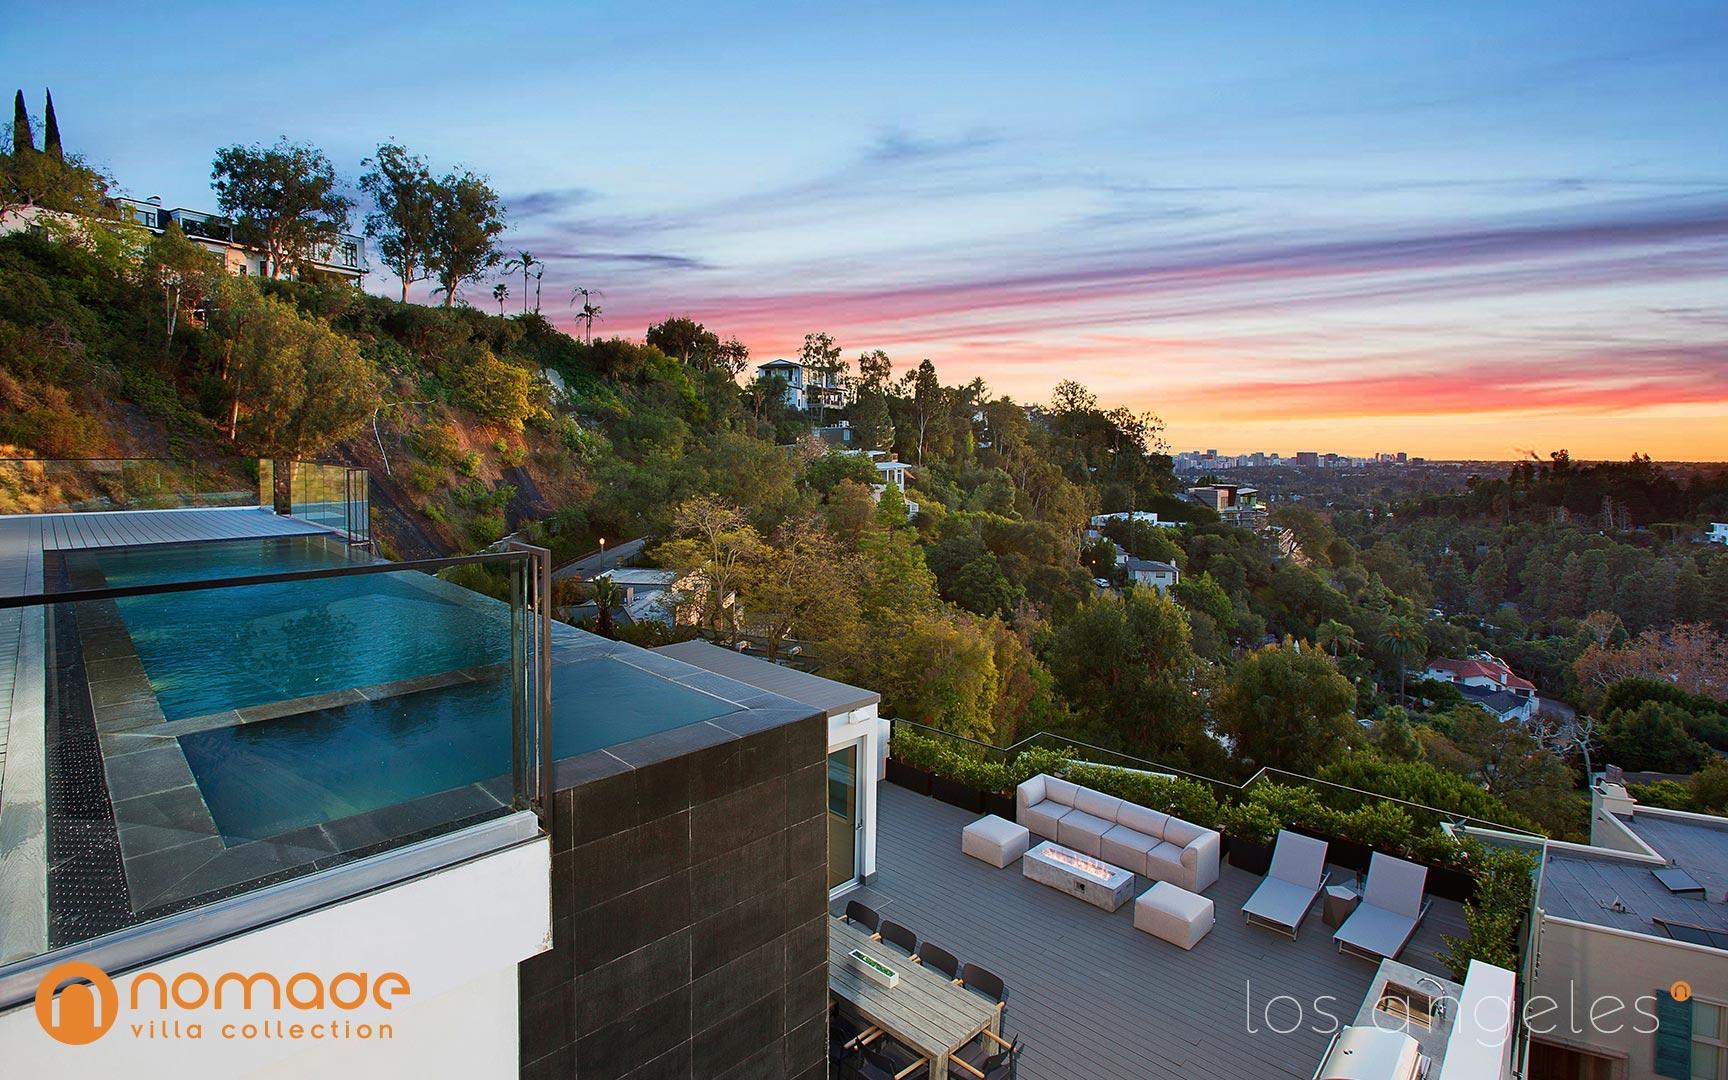 nomade-losangeles-BeverlyCrest-034